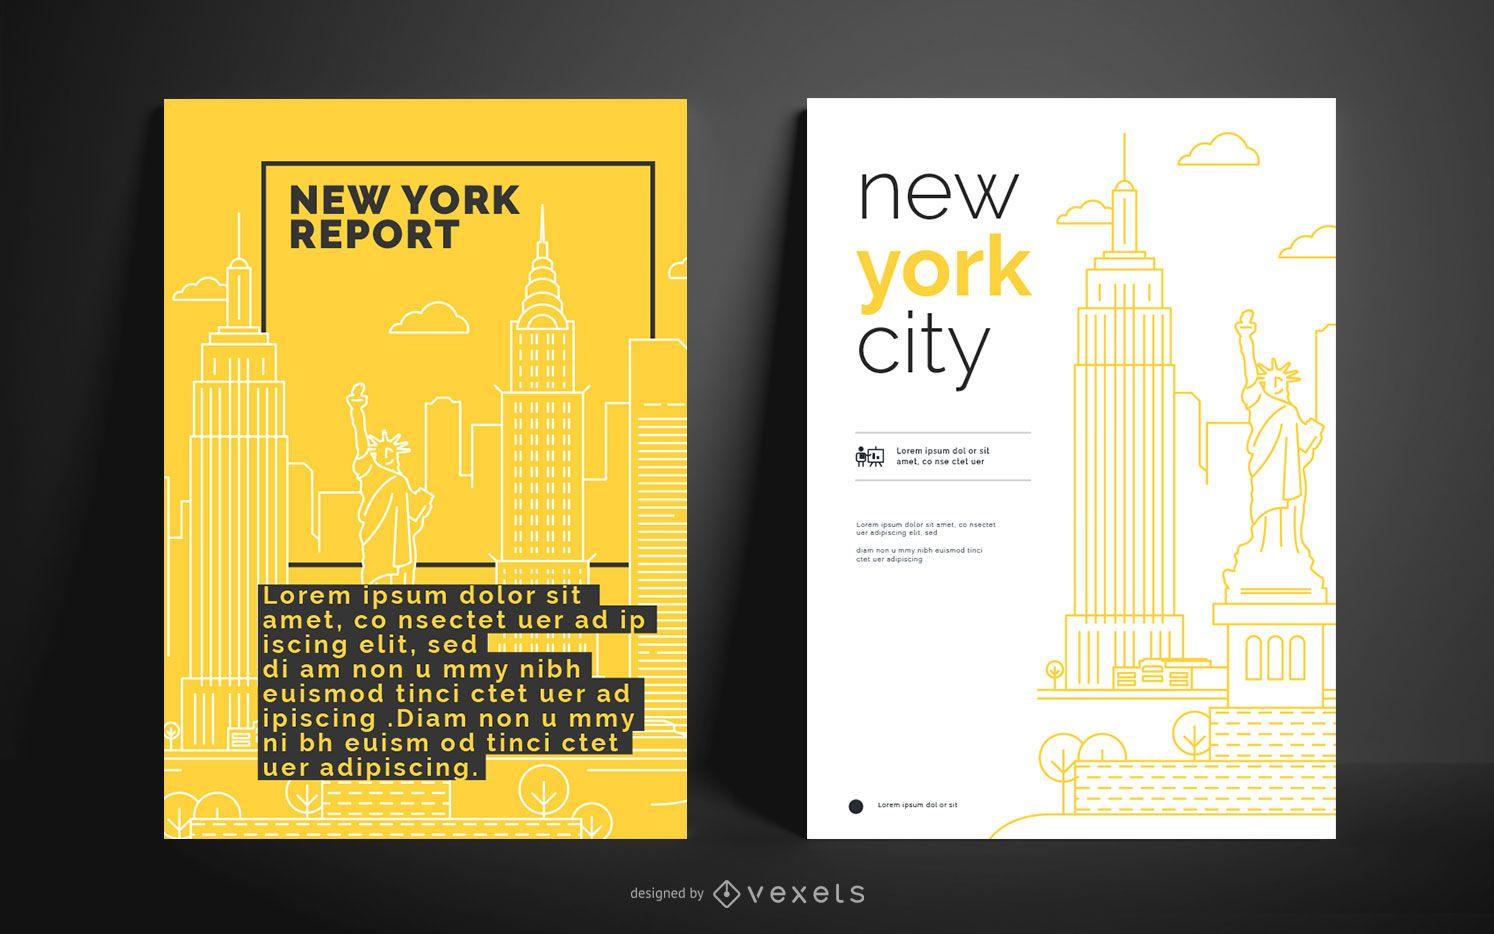 City Business Poster Design